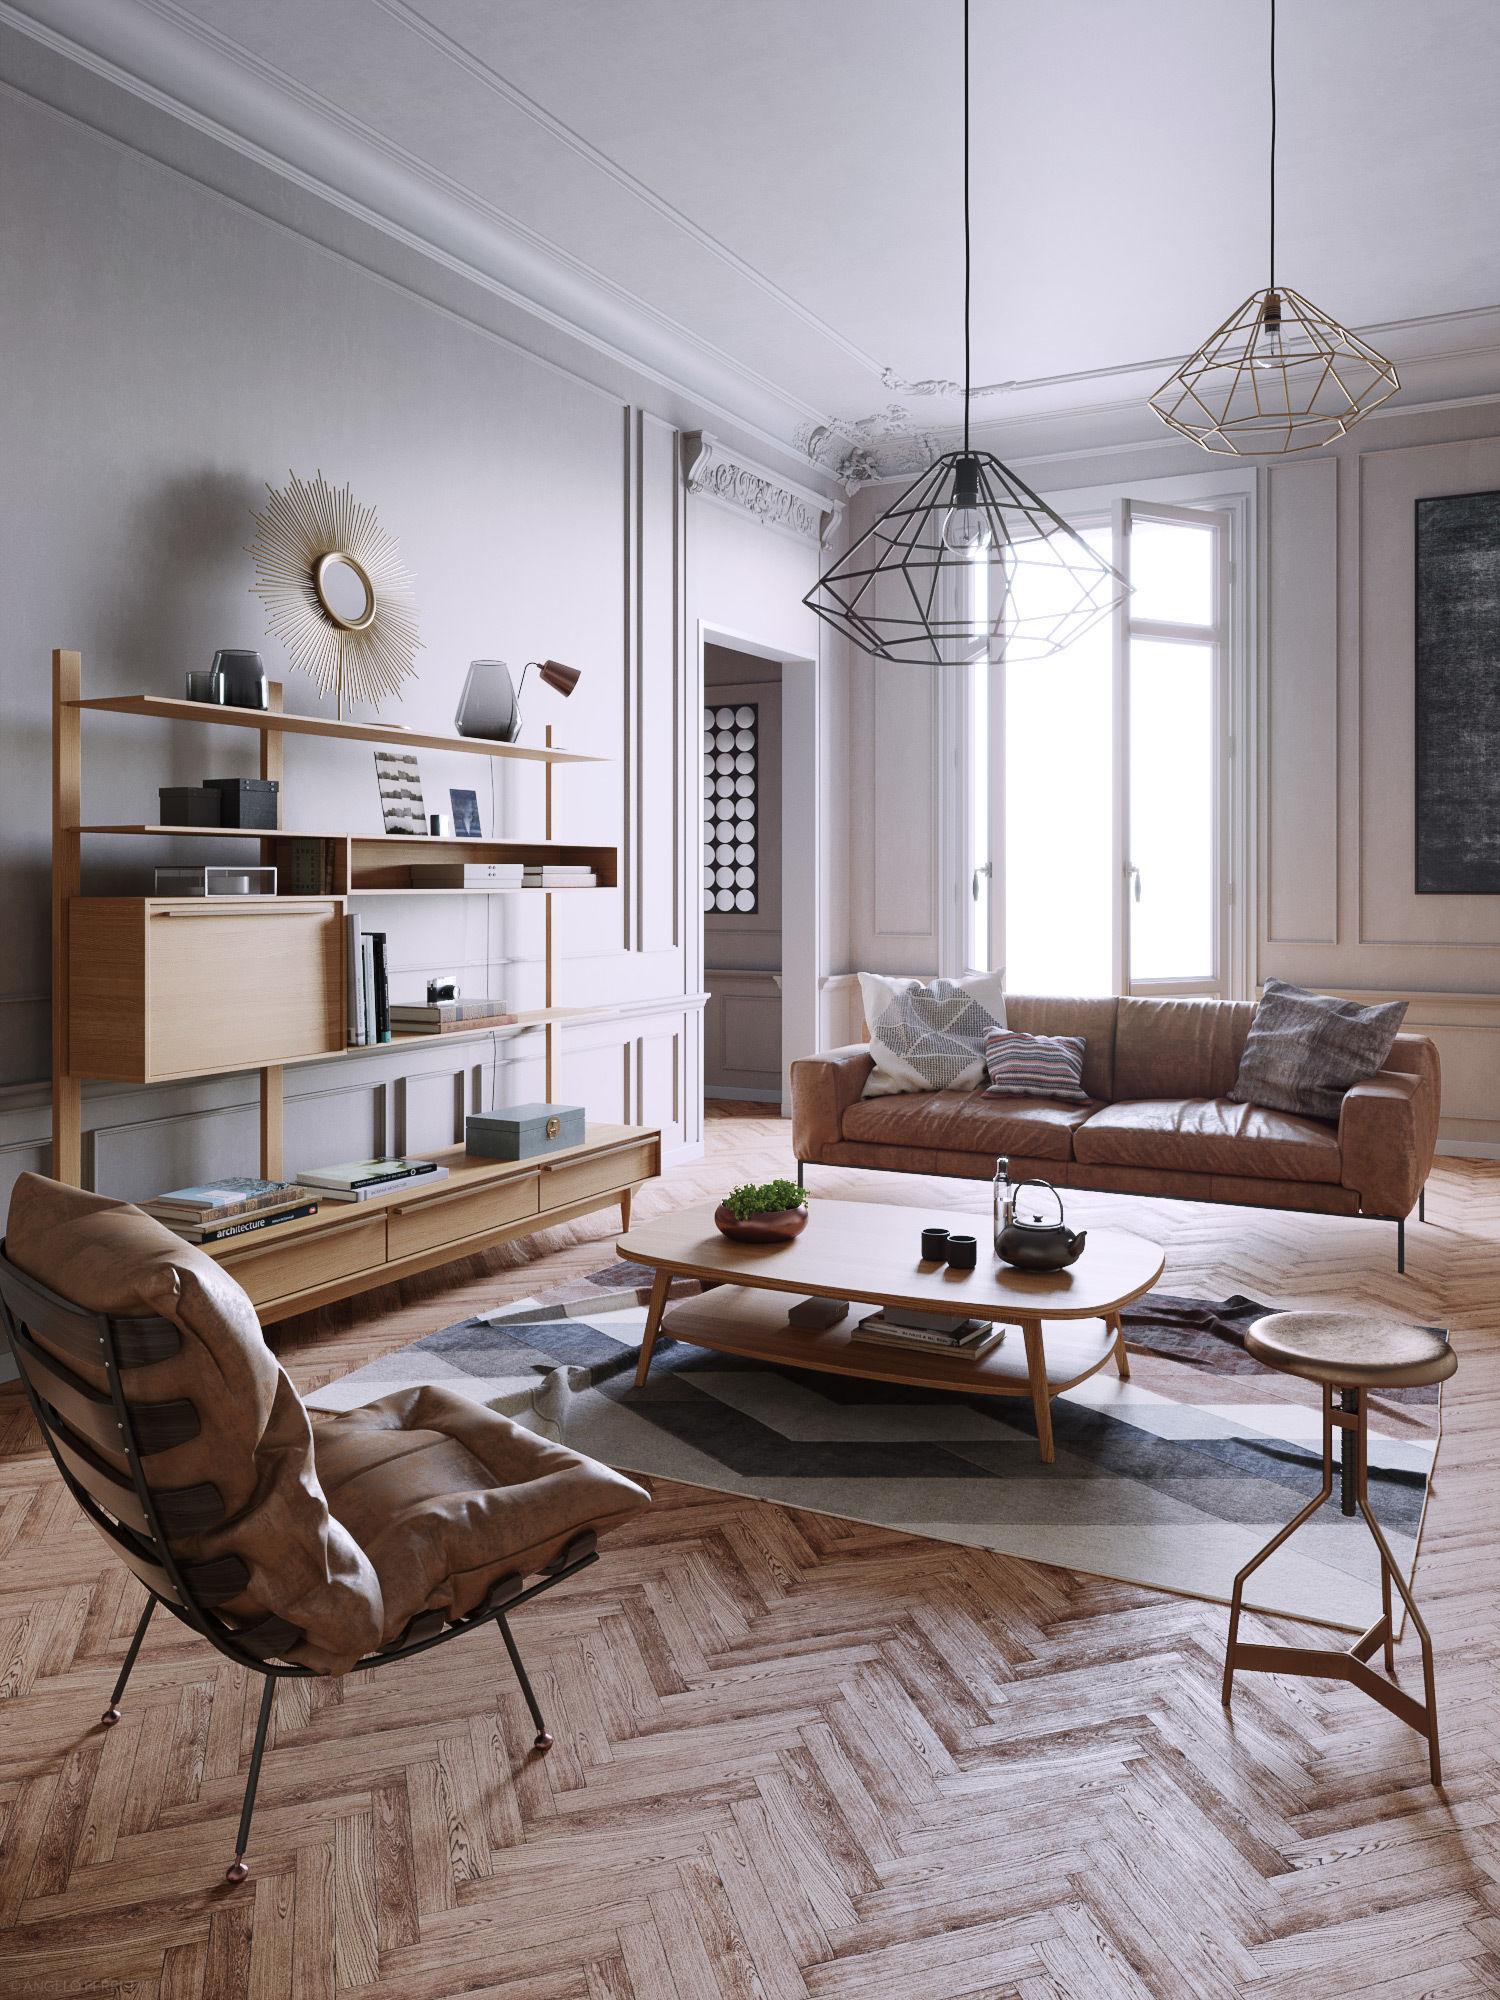 Mid Century interior scene